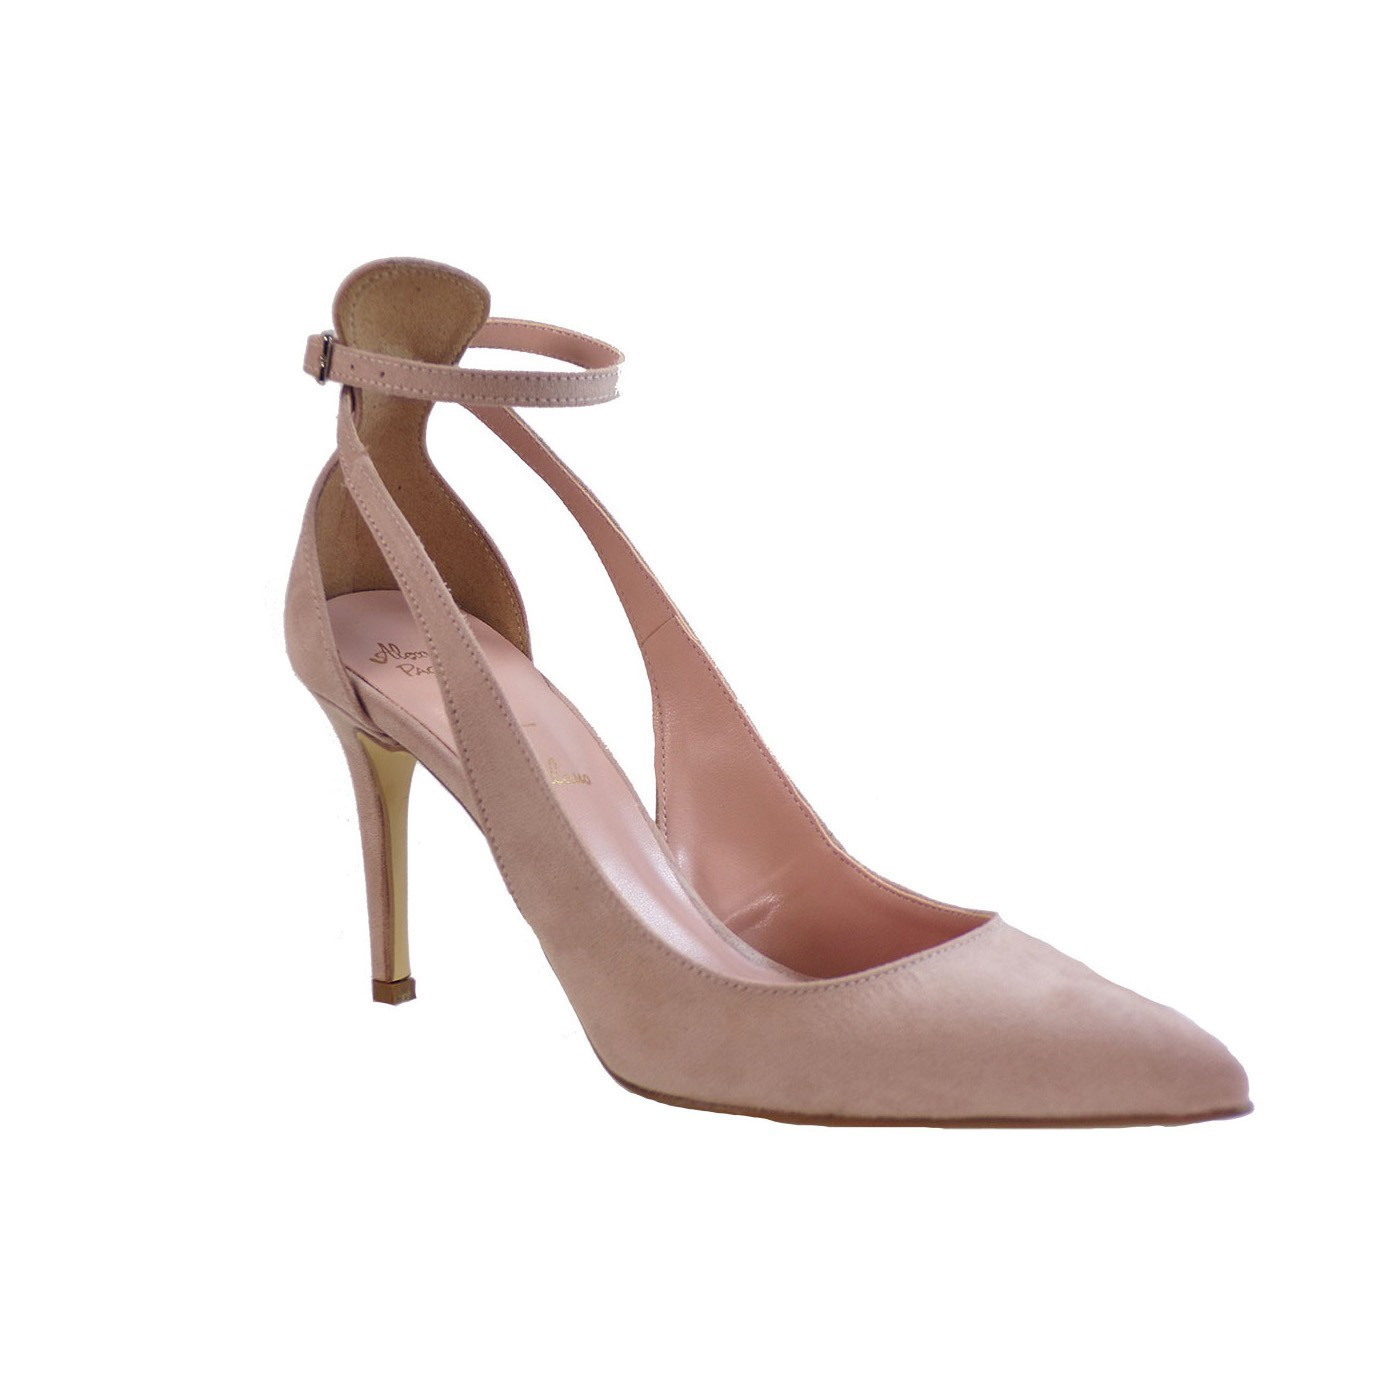 Alessandra Paggioti Γυναικεία Παπούτσια Γόβες 81534 Nude Καστόρι